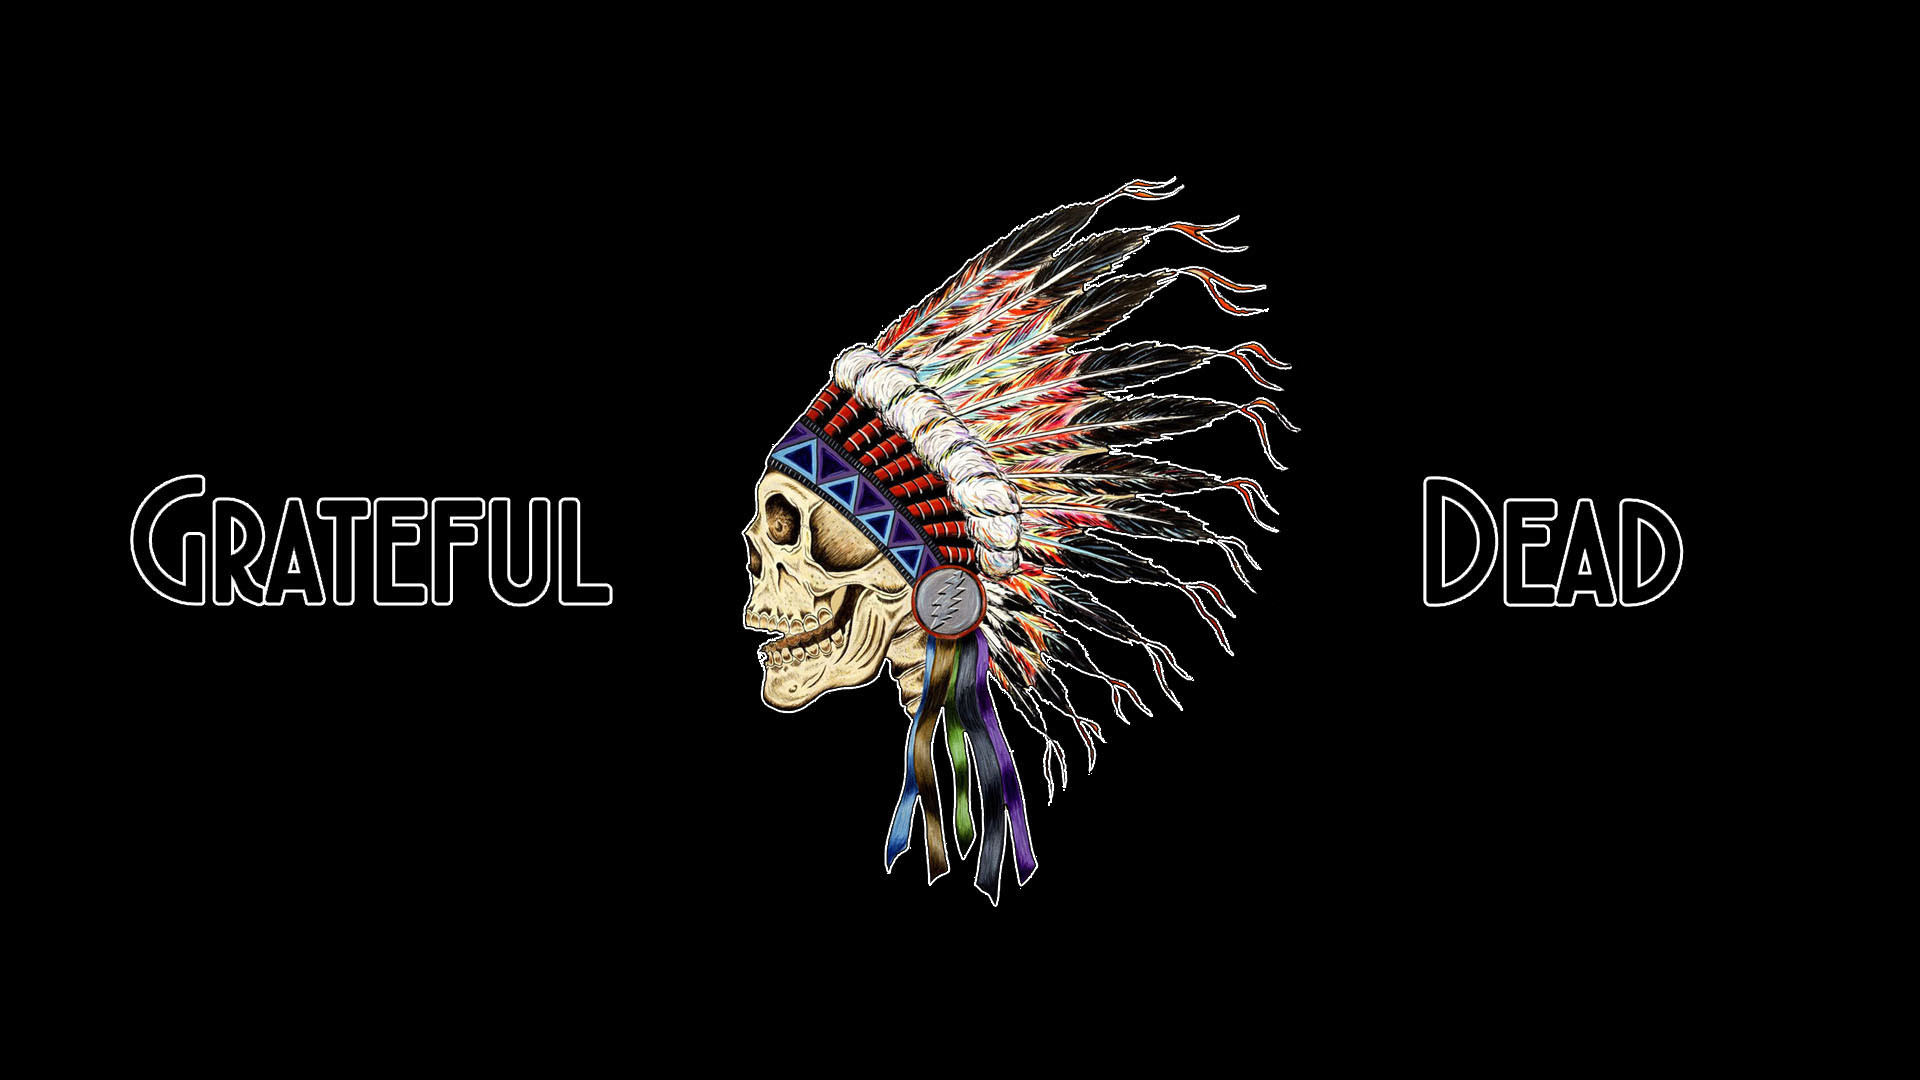 Res: 1920x1080, Music - Grateful Dead Wallpaper